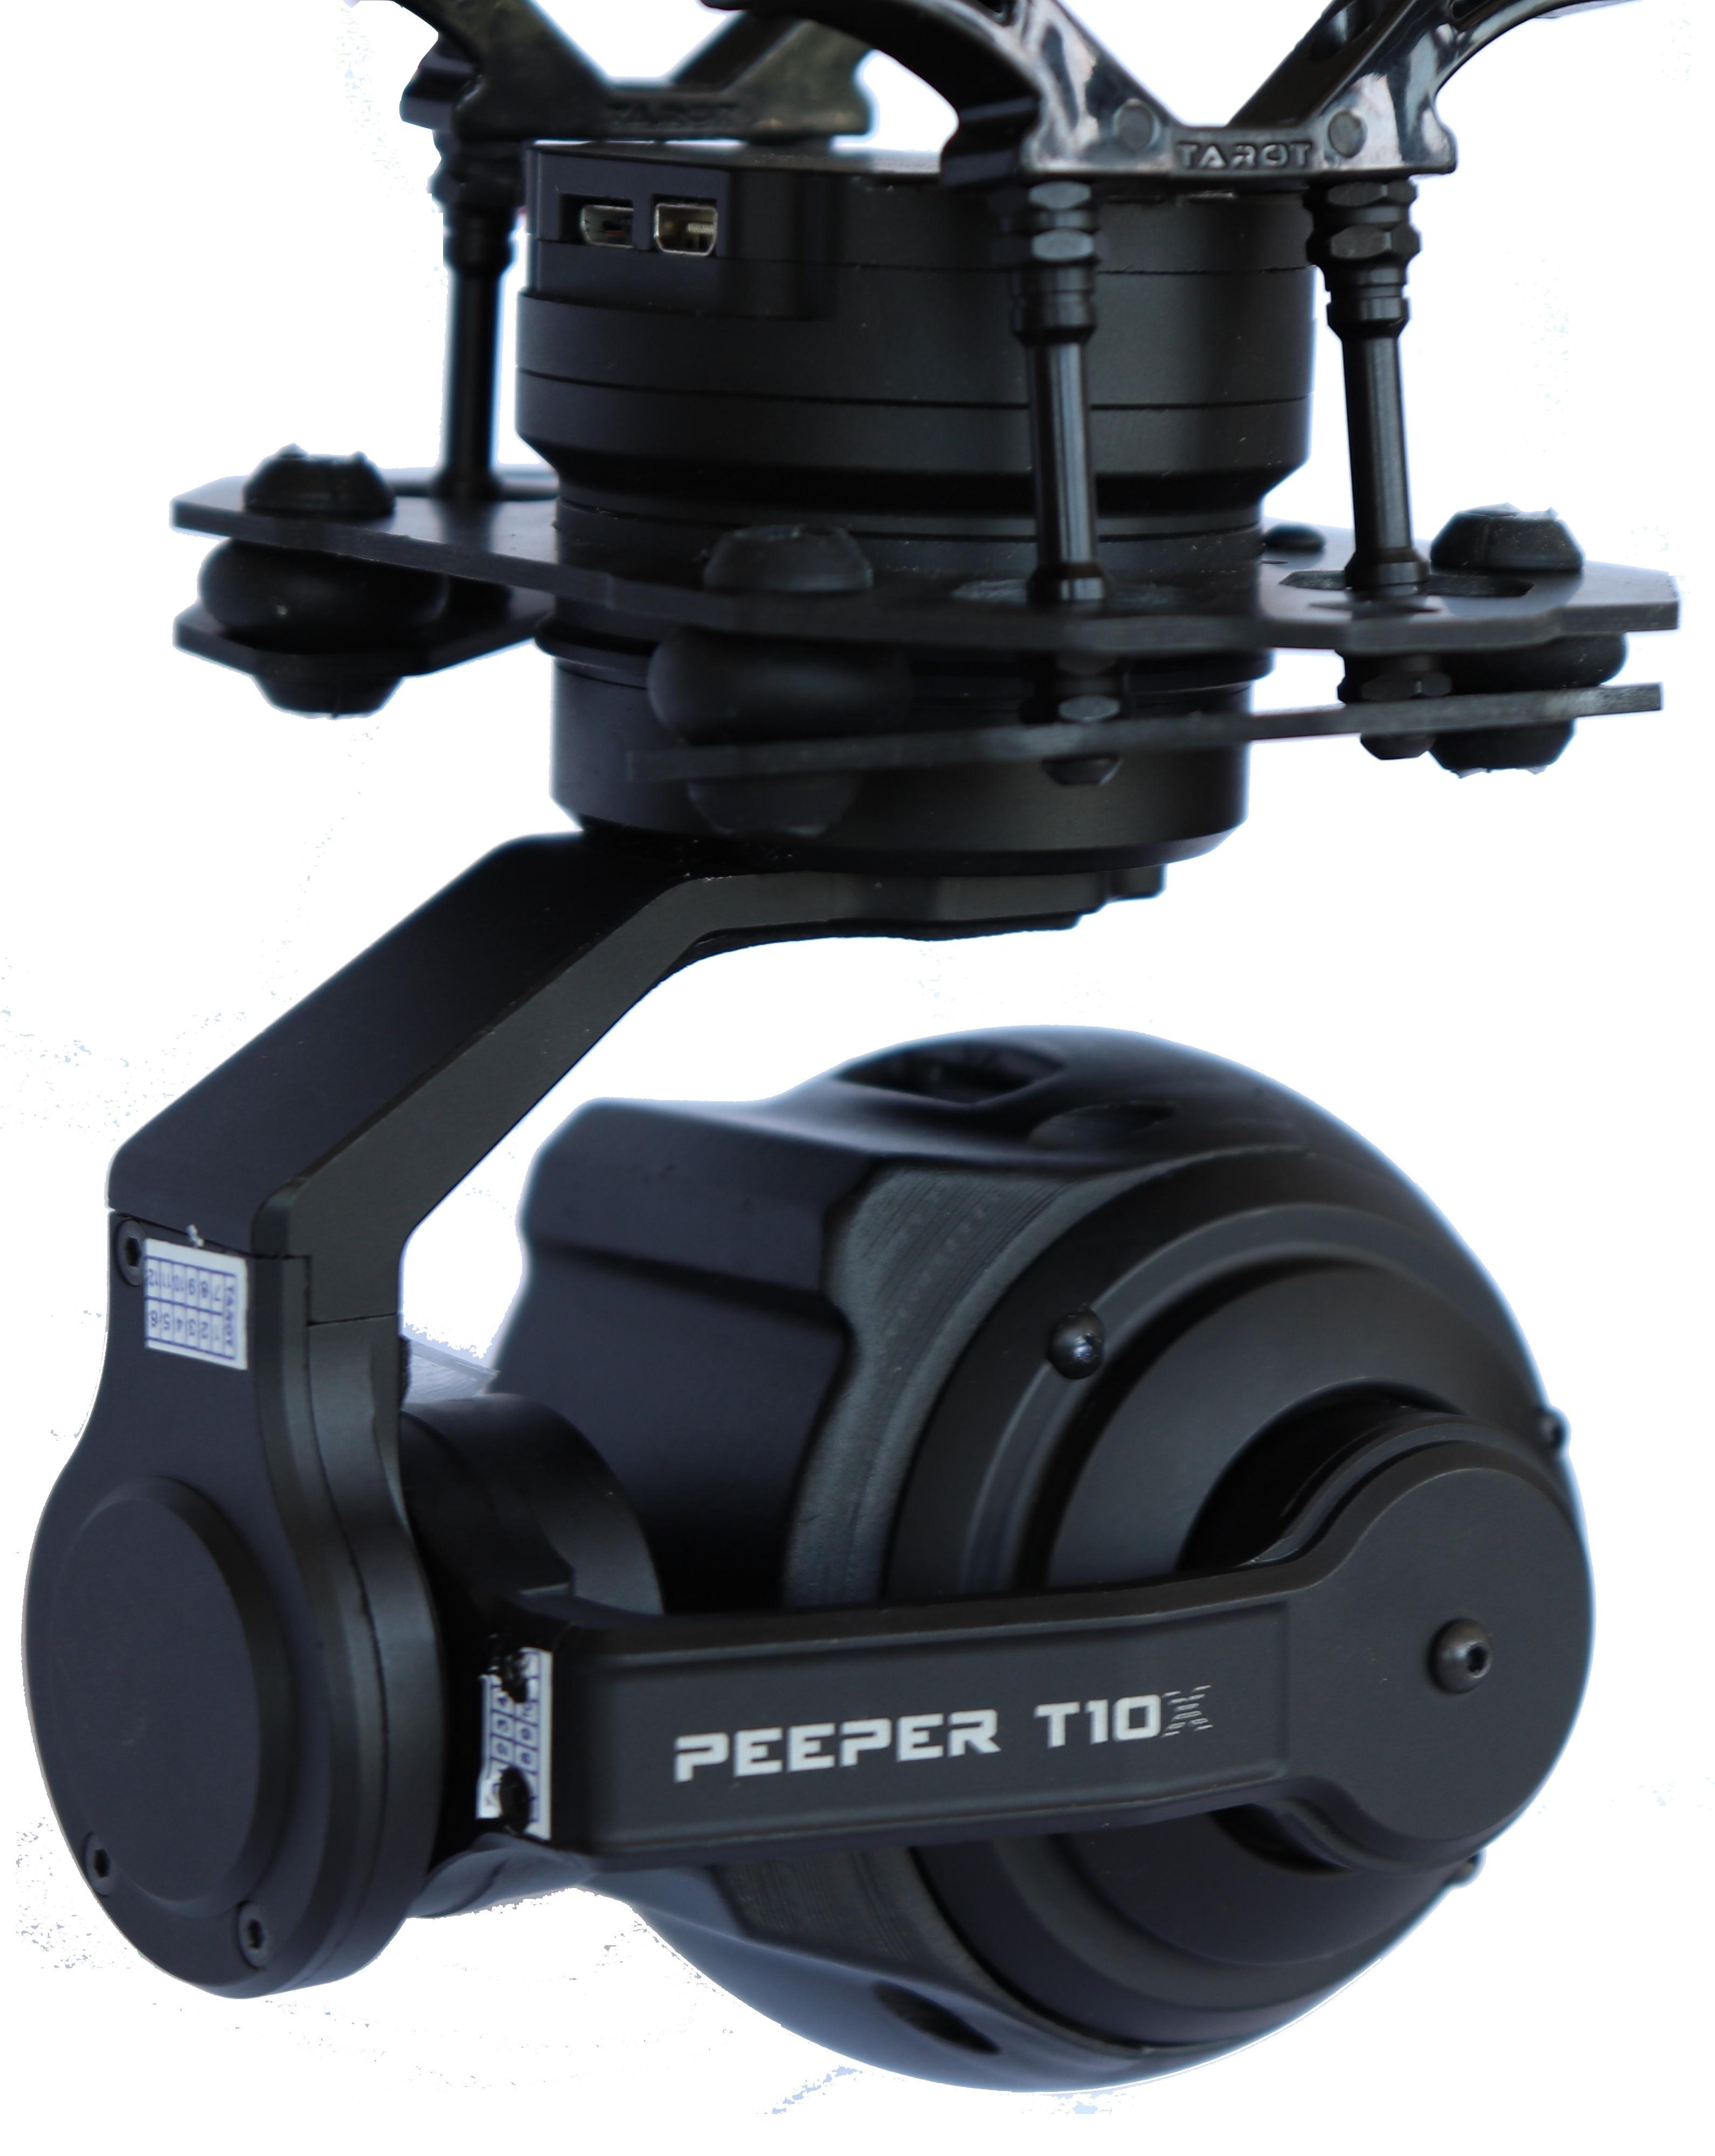 T10X برو الطائرات بدون طيار كاميرا زووم 10X كاميرا زووم بصري gimbal UAV كاميرا حرارية للتصوير الجوي